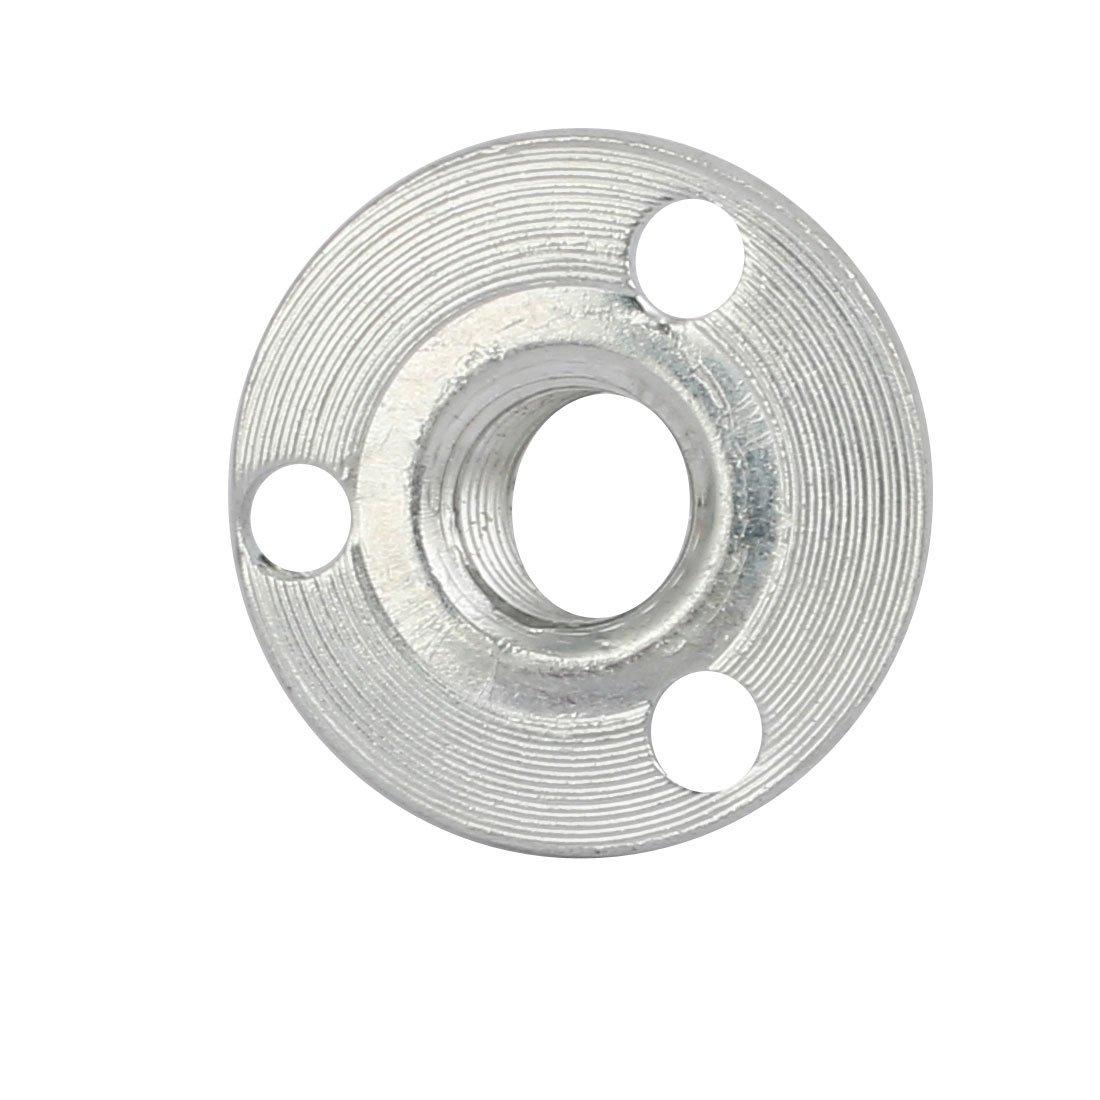 Fixman 402183 Cadena galvanizada en caliente Plata 4 mm x 10 m